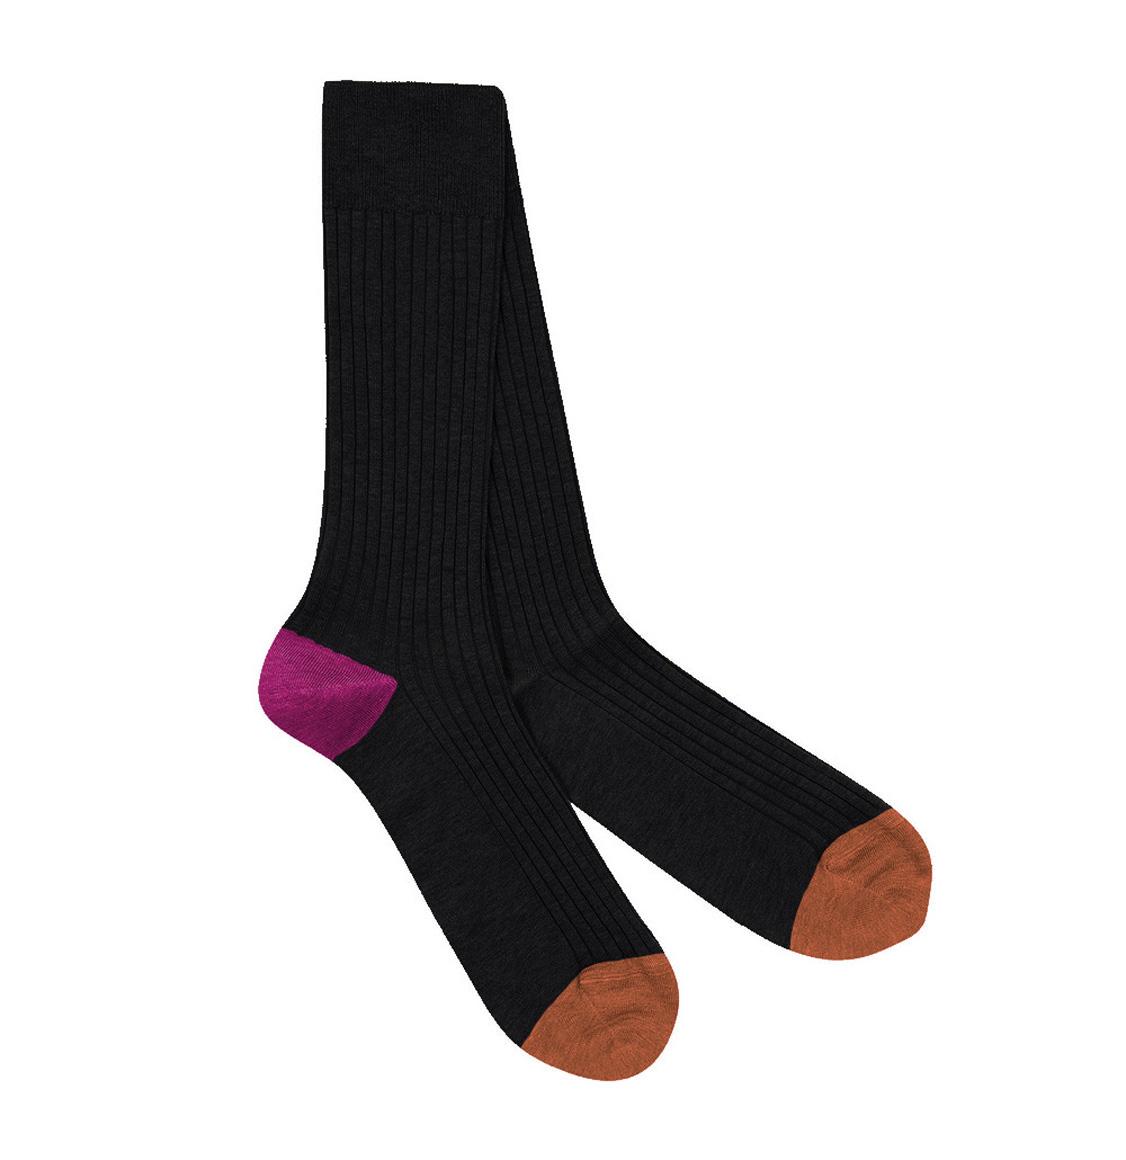 Pantherella Socks Portobello Black